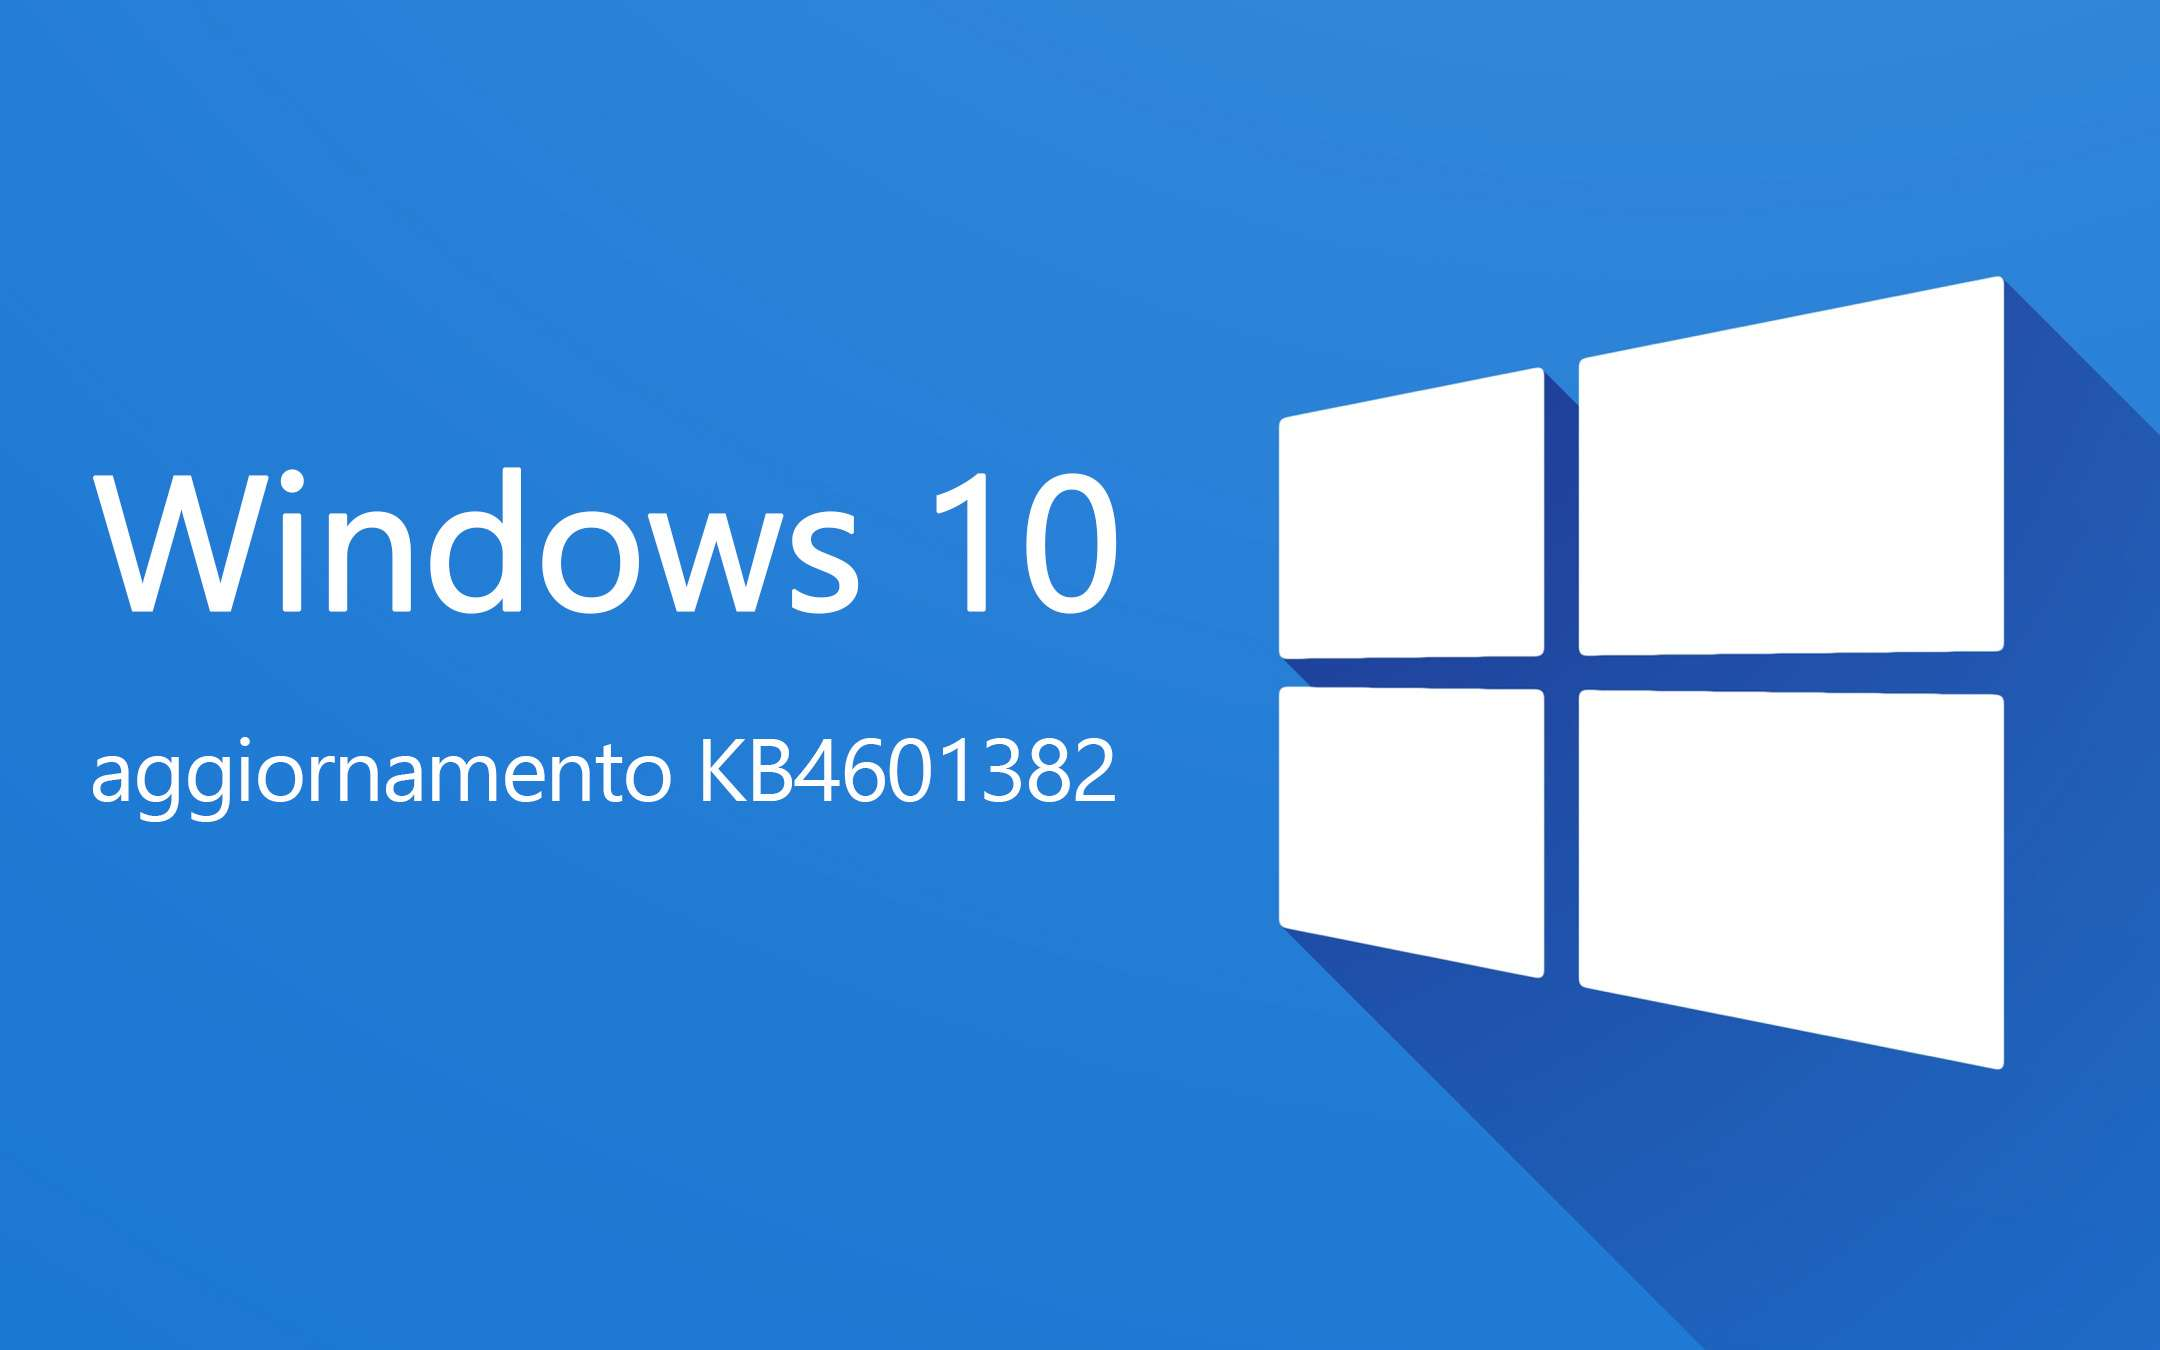 Windows 10: KB4601382 update in download